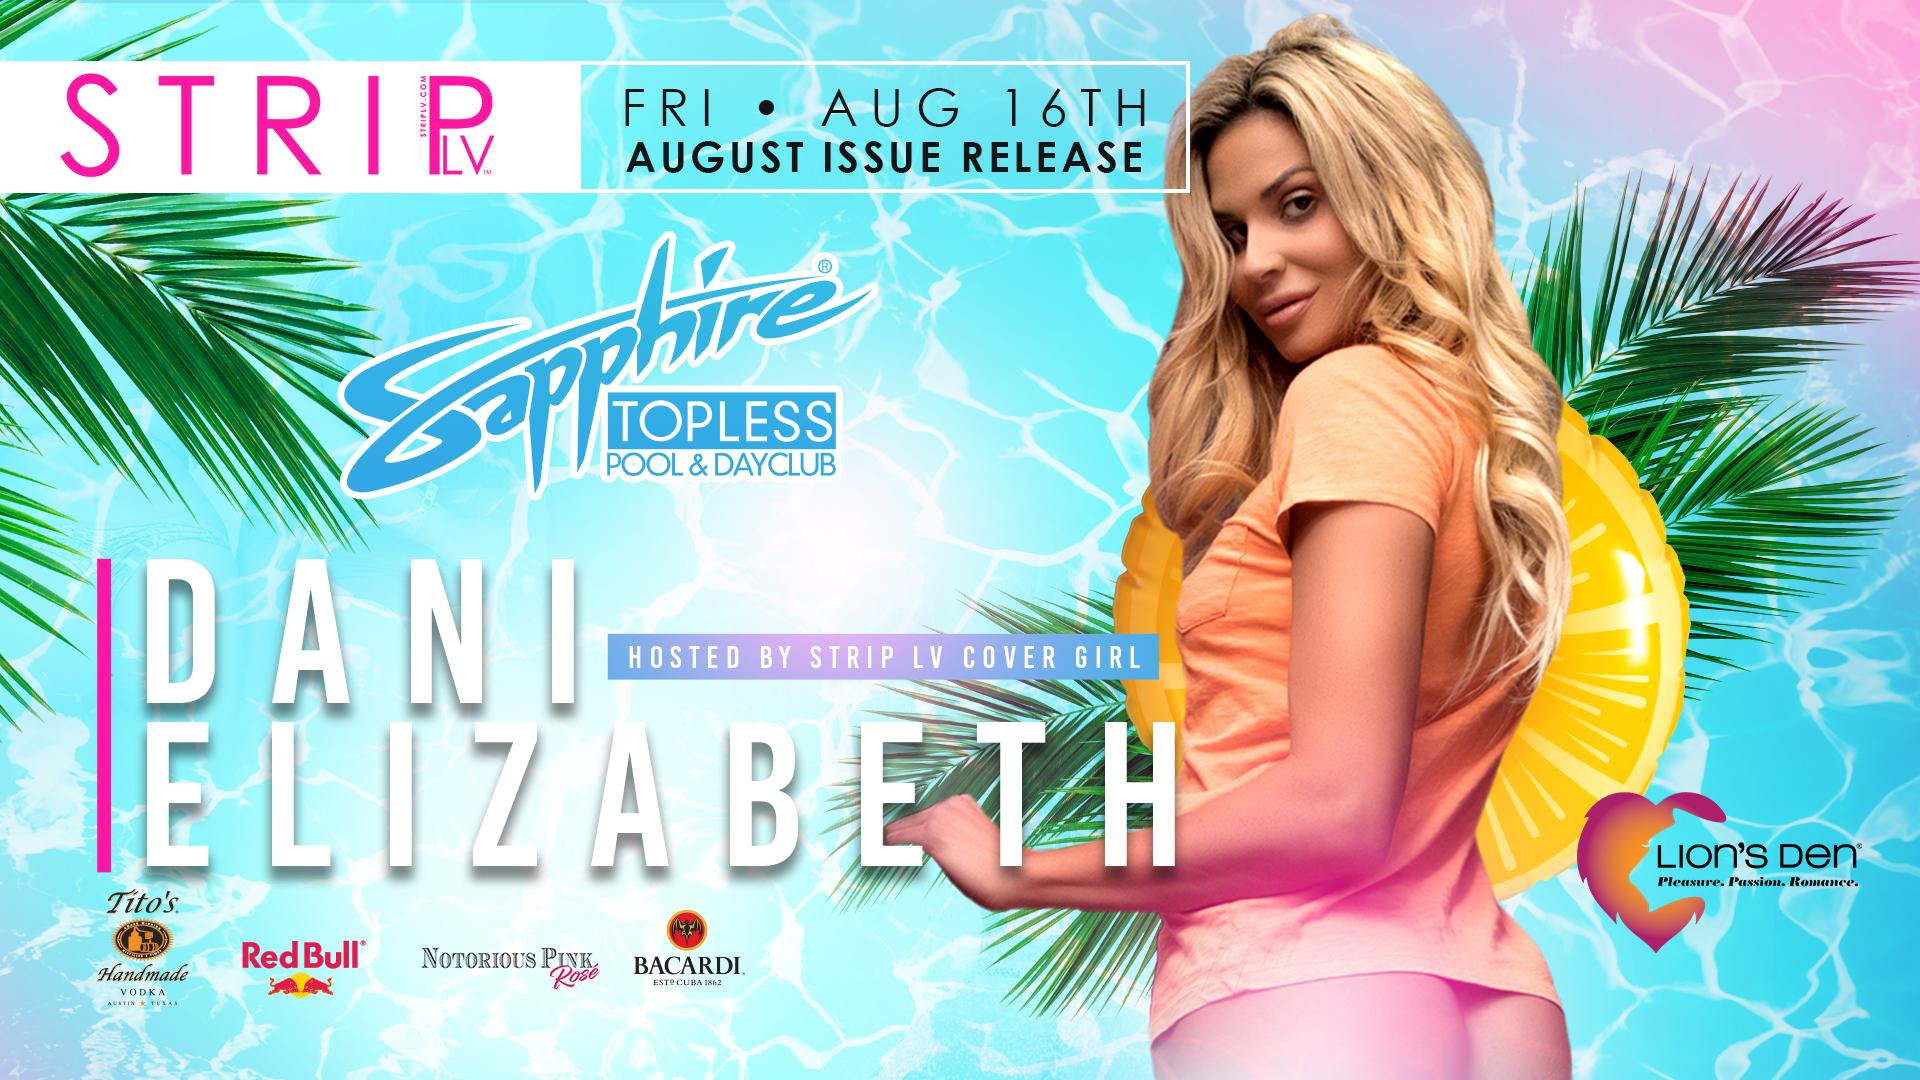 Hosted by Strip LV Cover Girl Dani Elizabeth